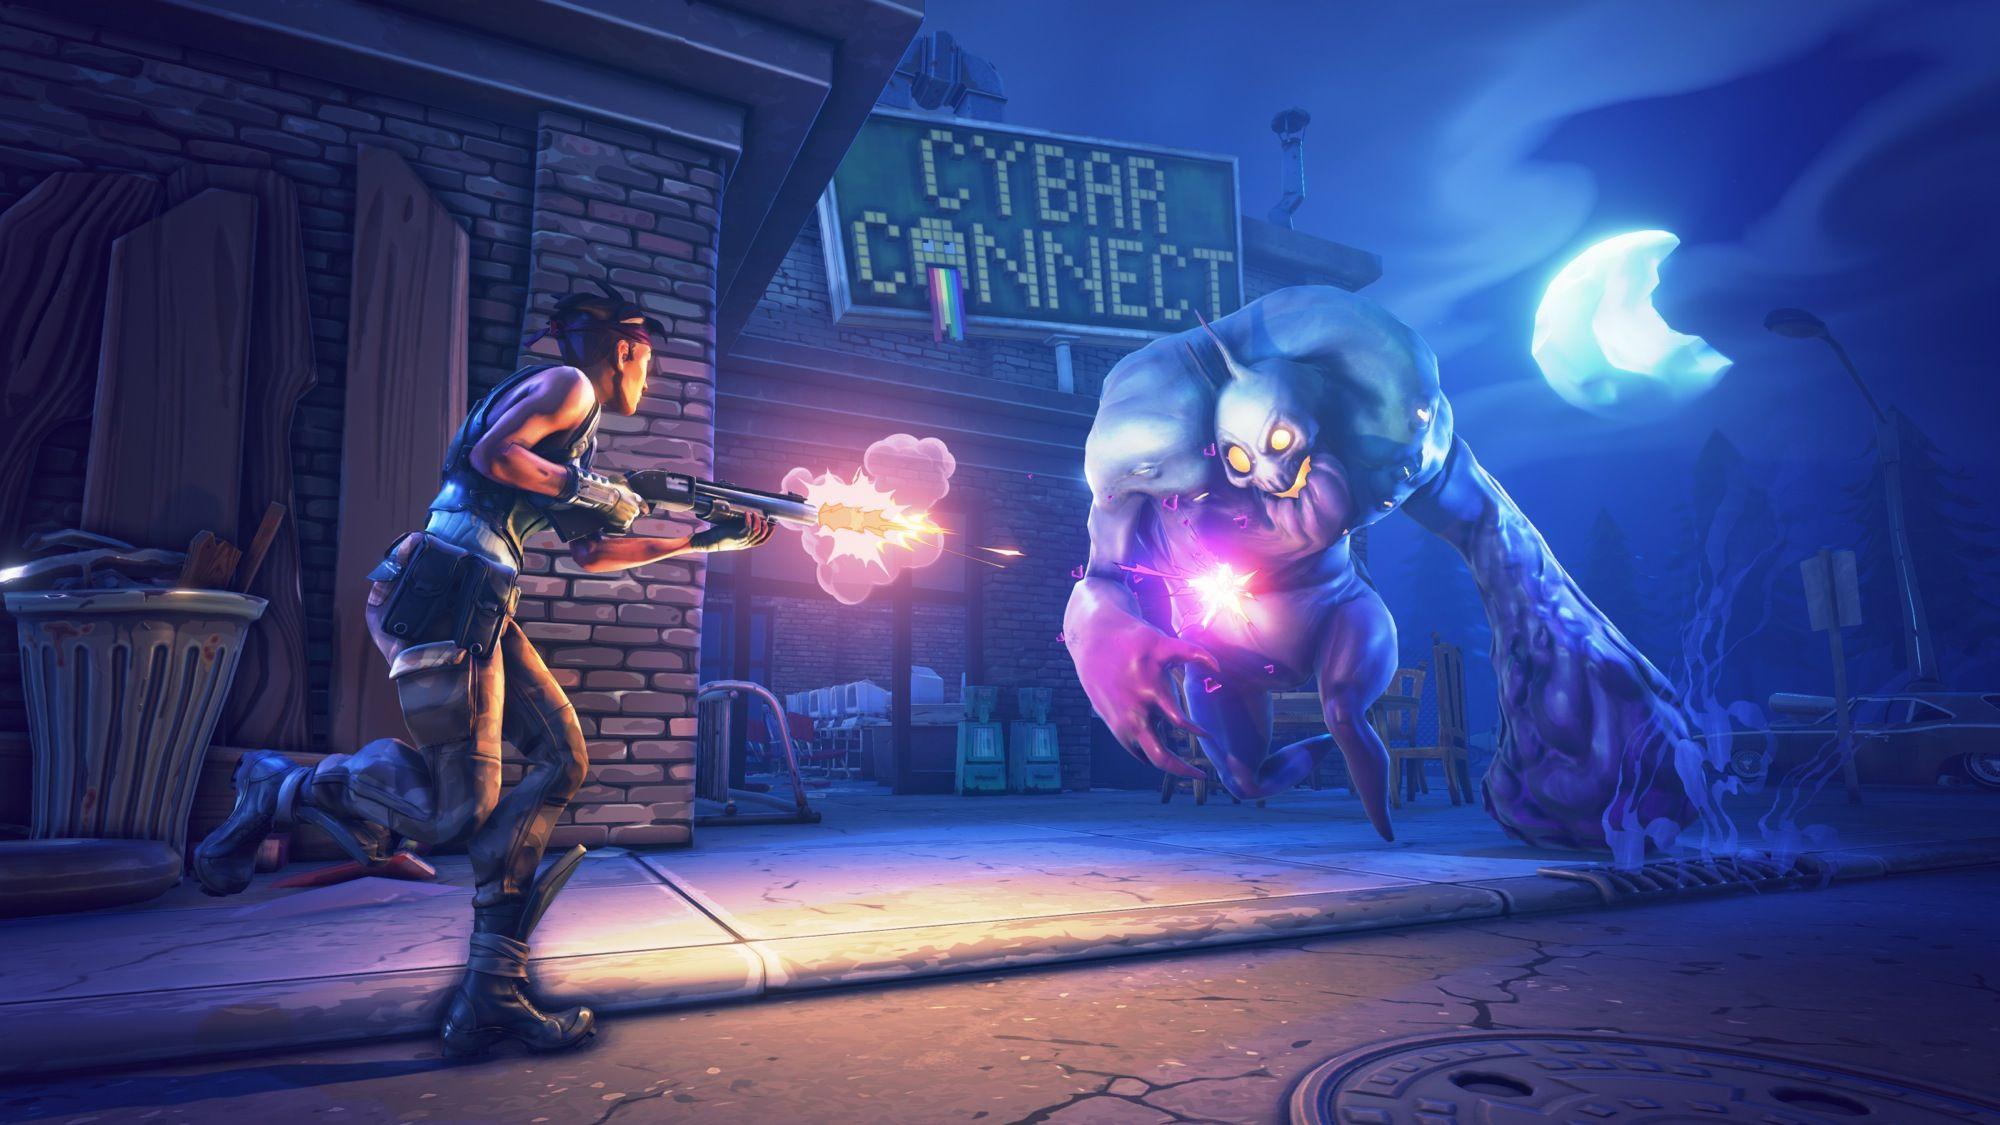 Cool games Battle royale game, Fortnite, Epic games